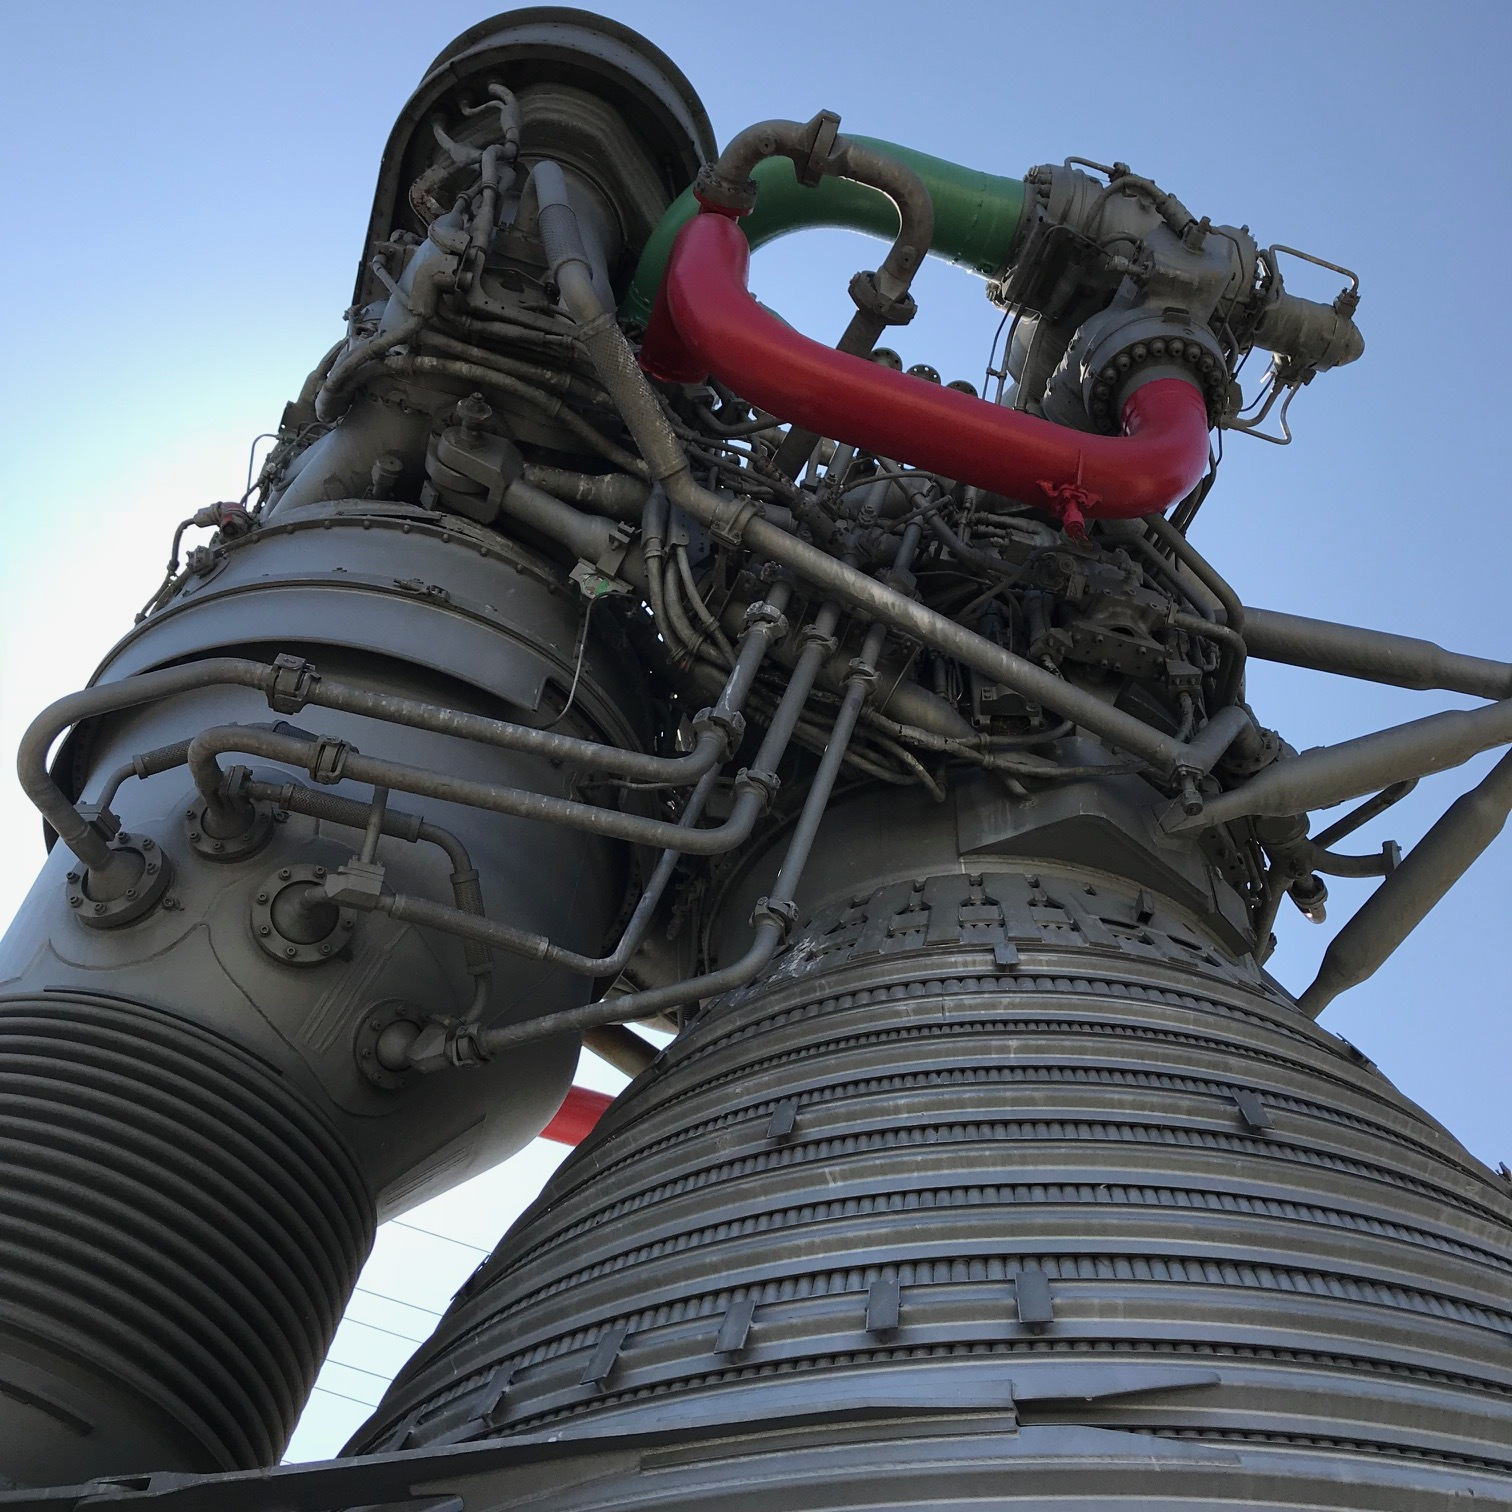 Upward view of the F-1 Rocket Engine